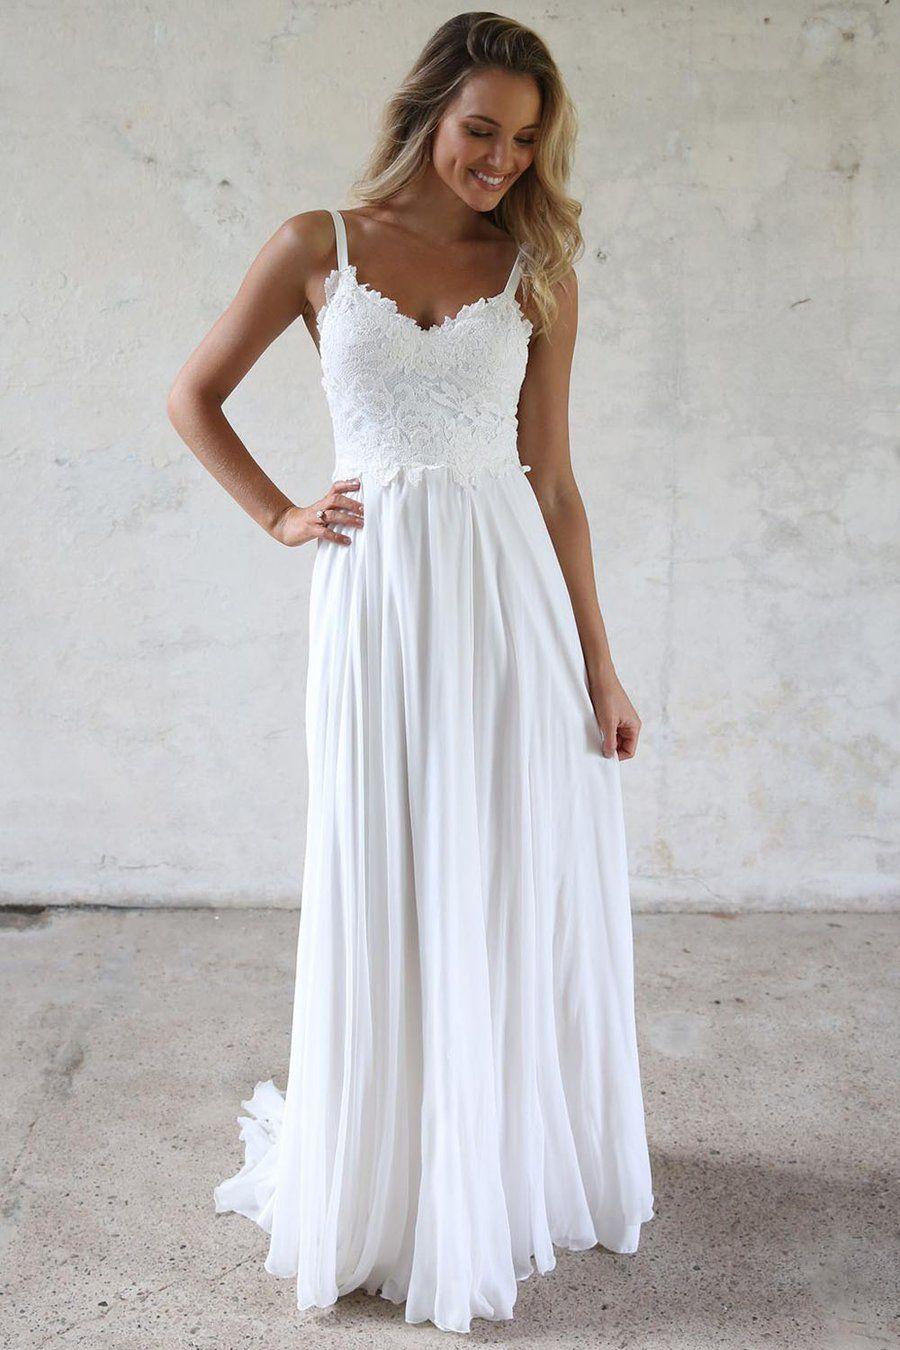 Aline Spaghetti Straps Lace Top Beach Wedding Dresses